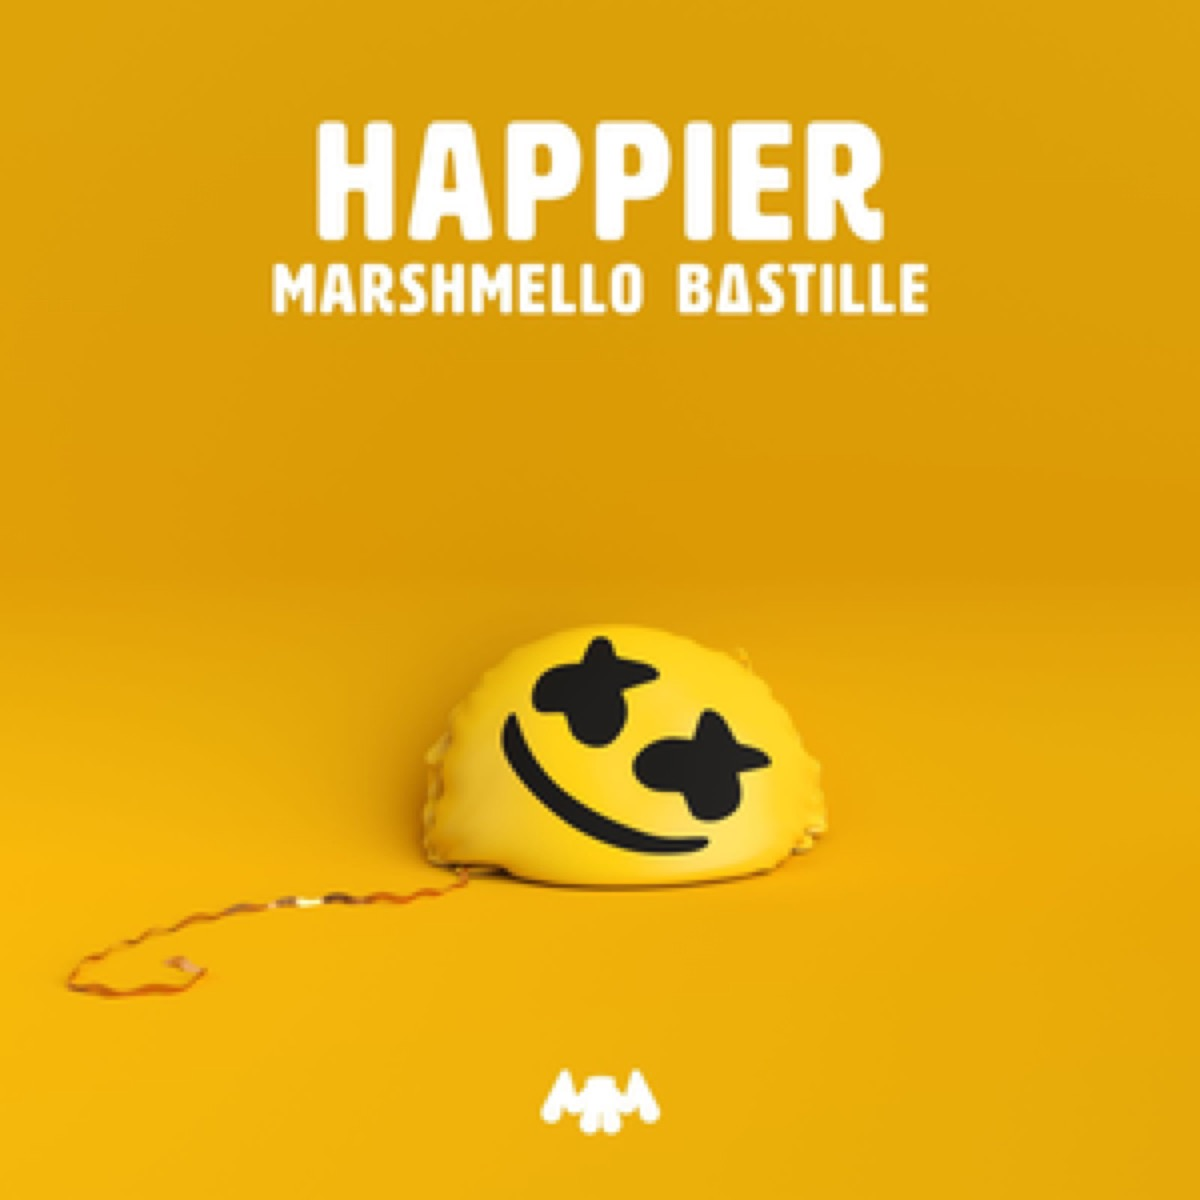 happier by marshmello and bastille cover art, best breakup songs